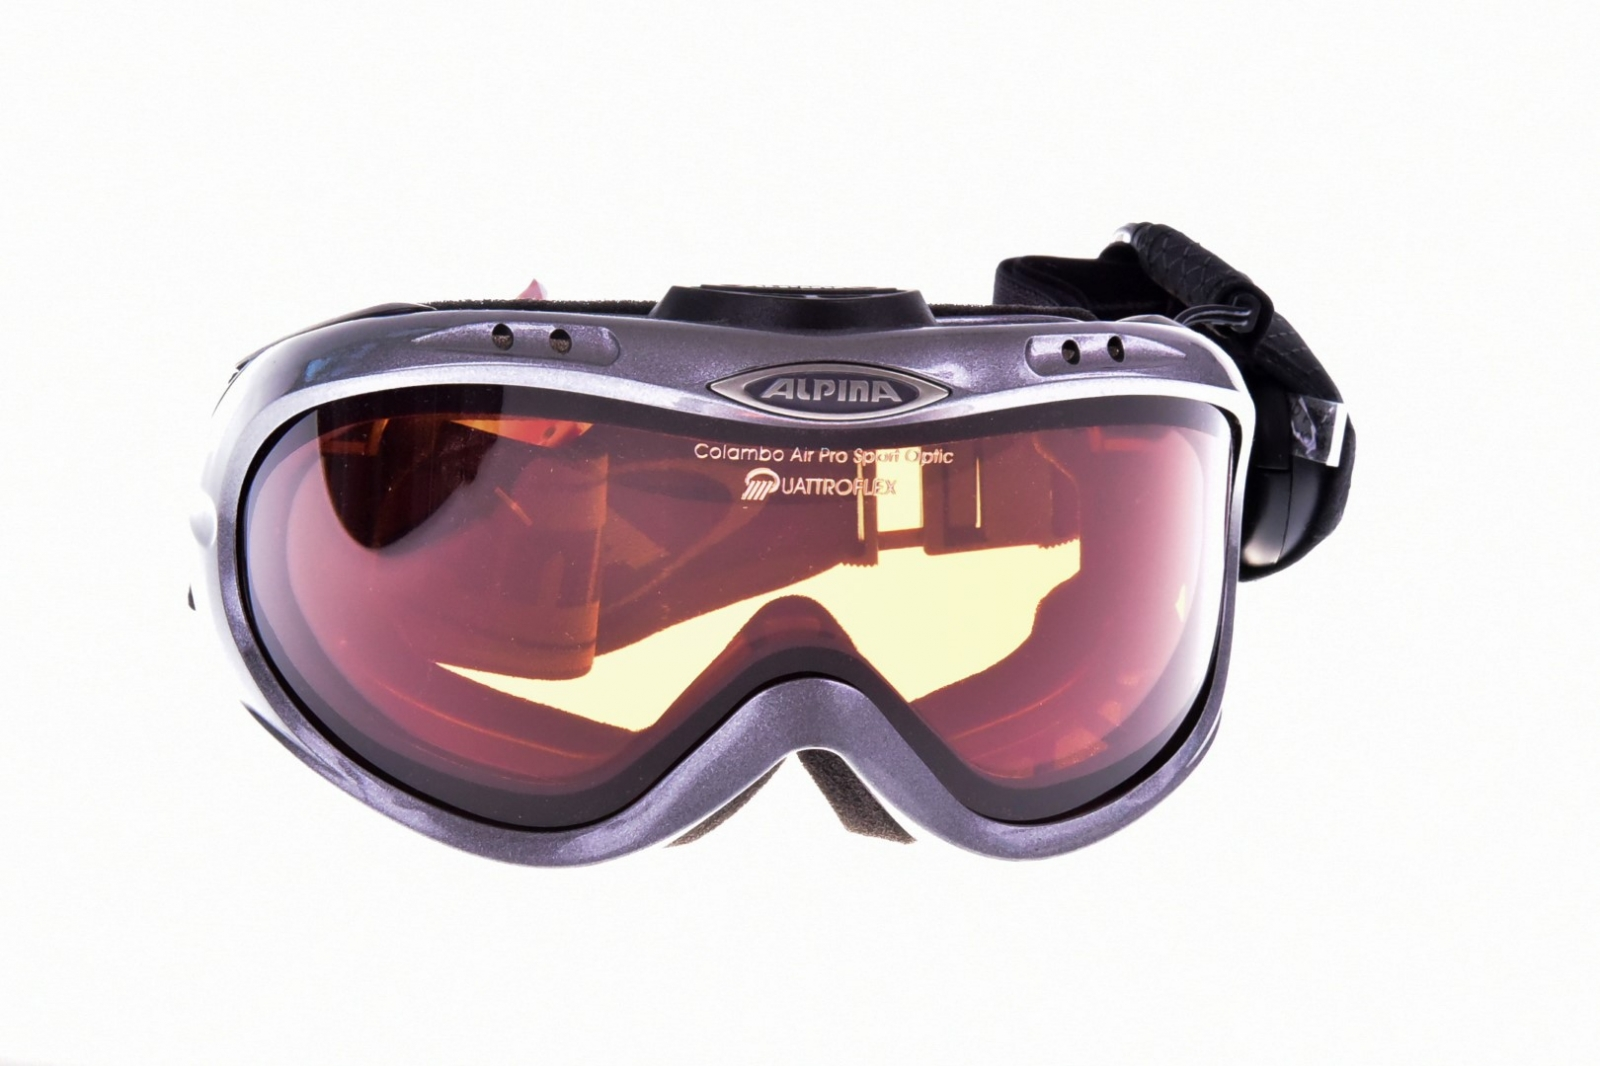 23b0d1a7d Alpina A7059026 - Lyžiarske okuliare - GemaShop.sk